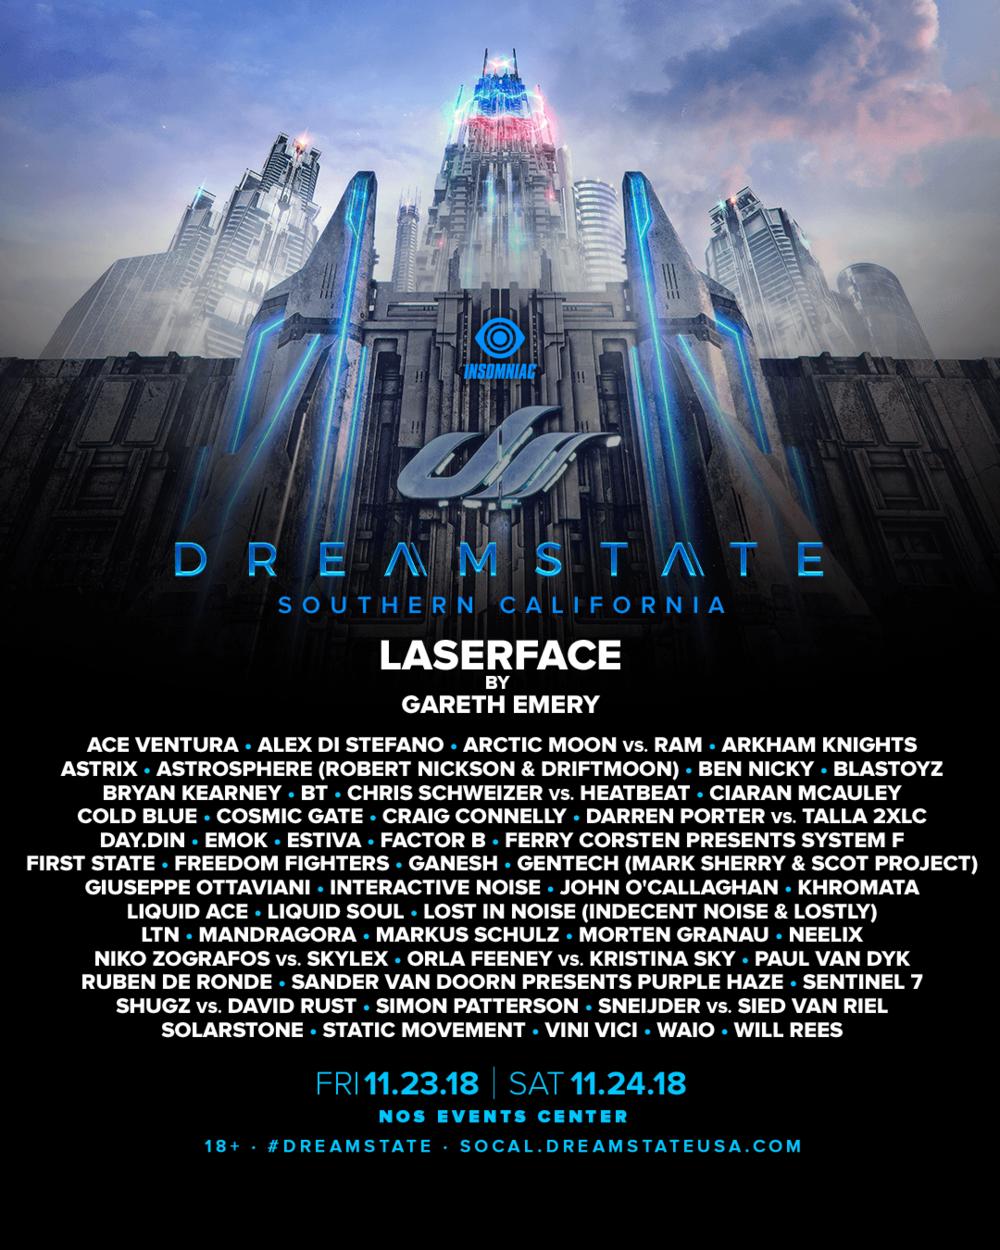 dreamstate_socal_2018_lu_full_lineup_laserface_social_assets_1080x1350_r01v01-compressor.png